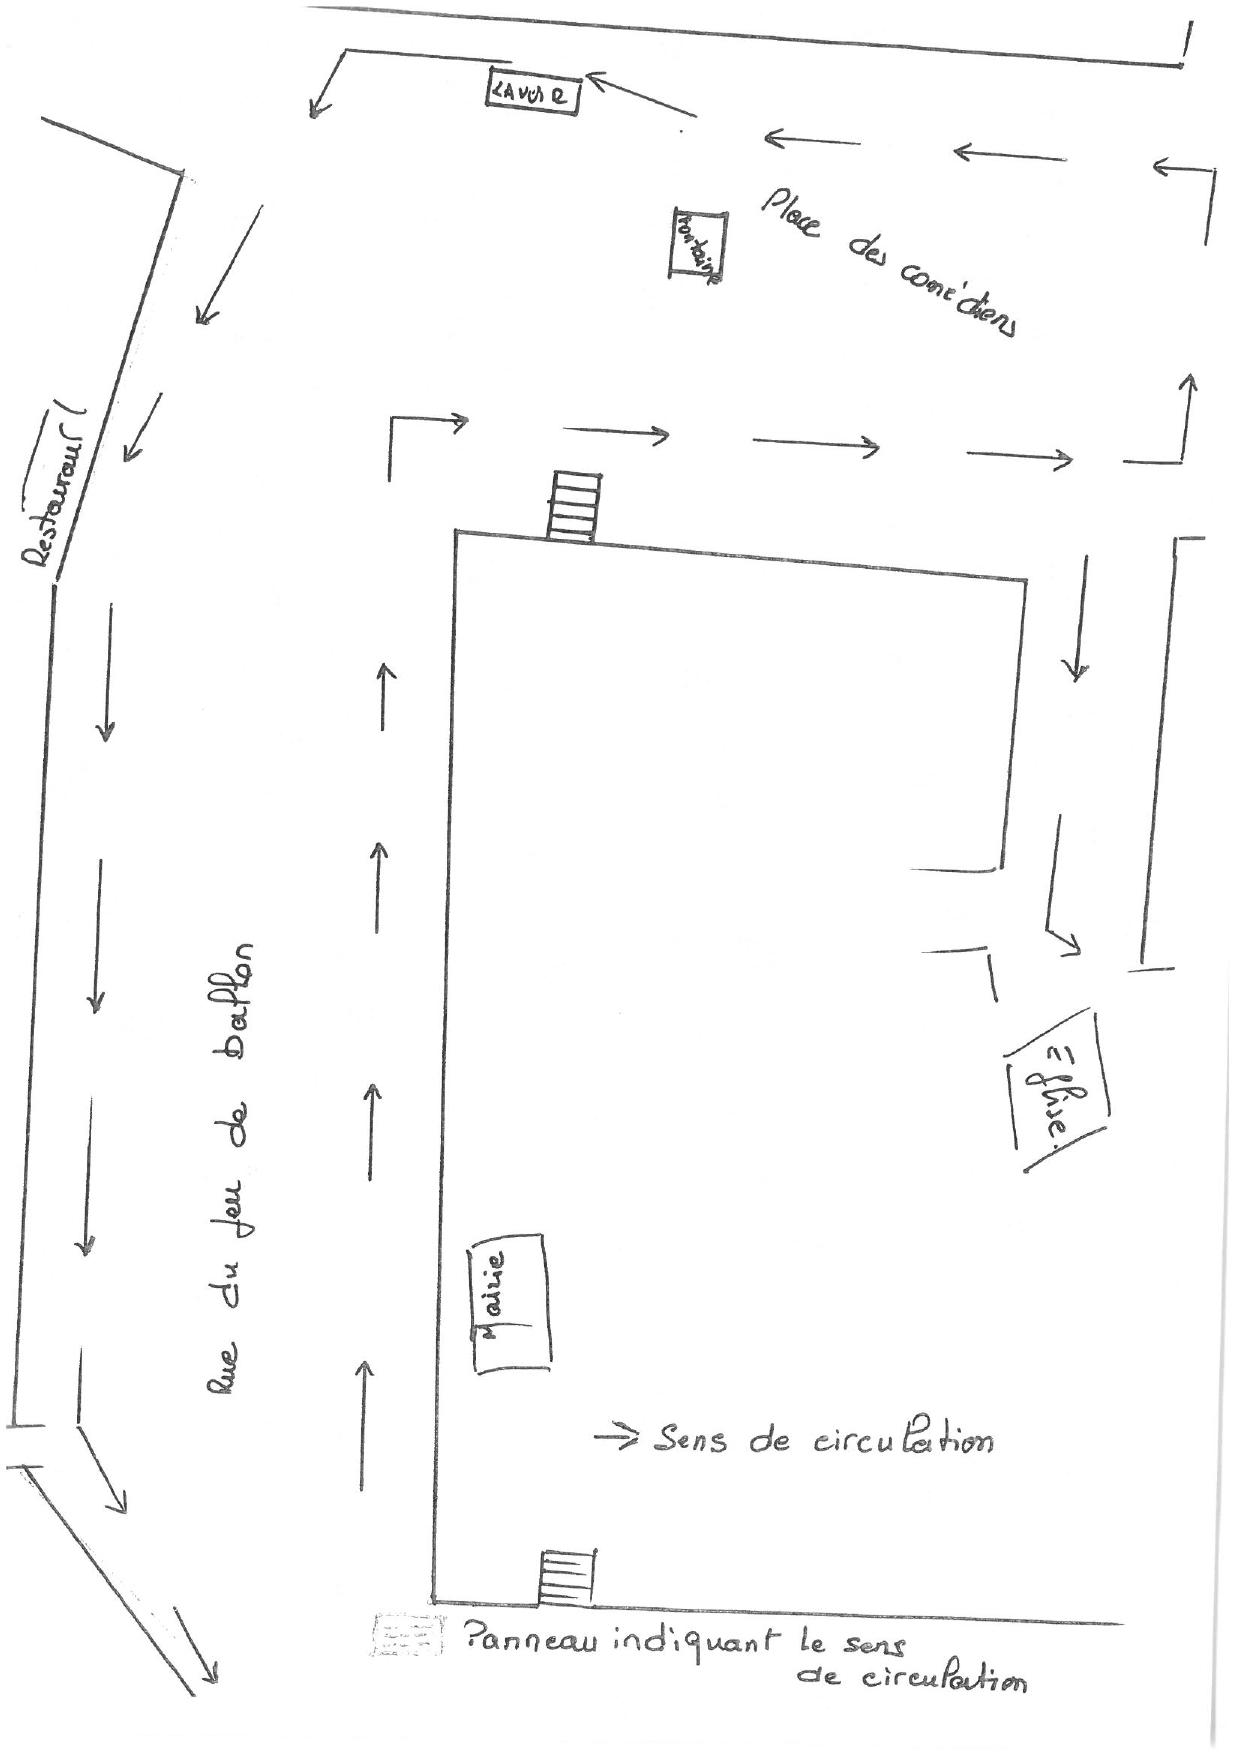 Plan circulation marché de Salasc